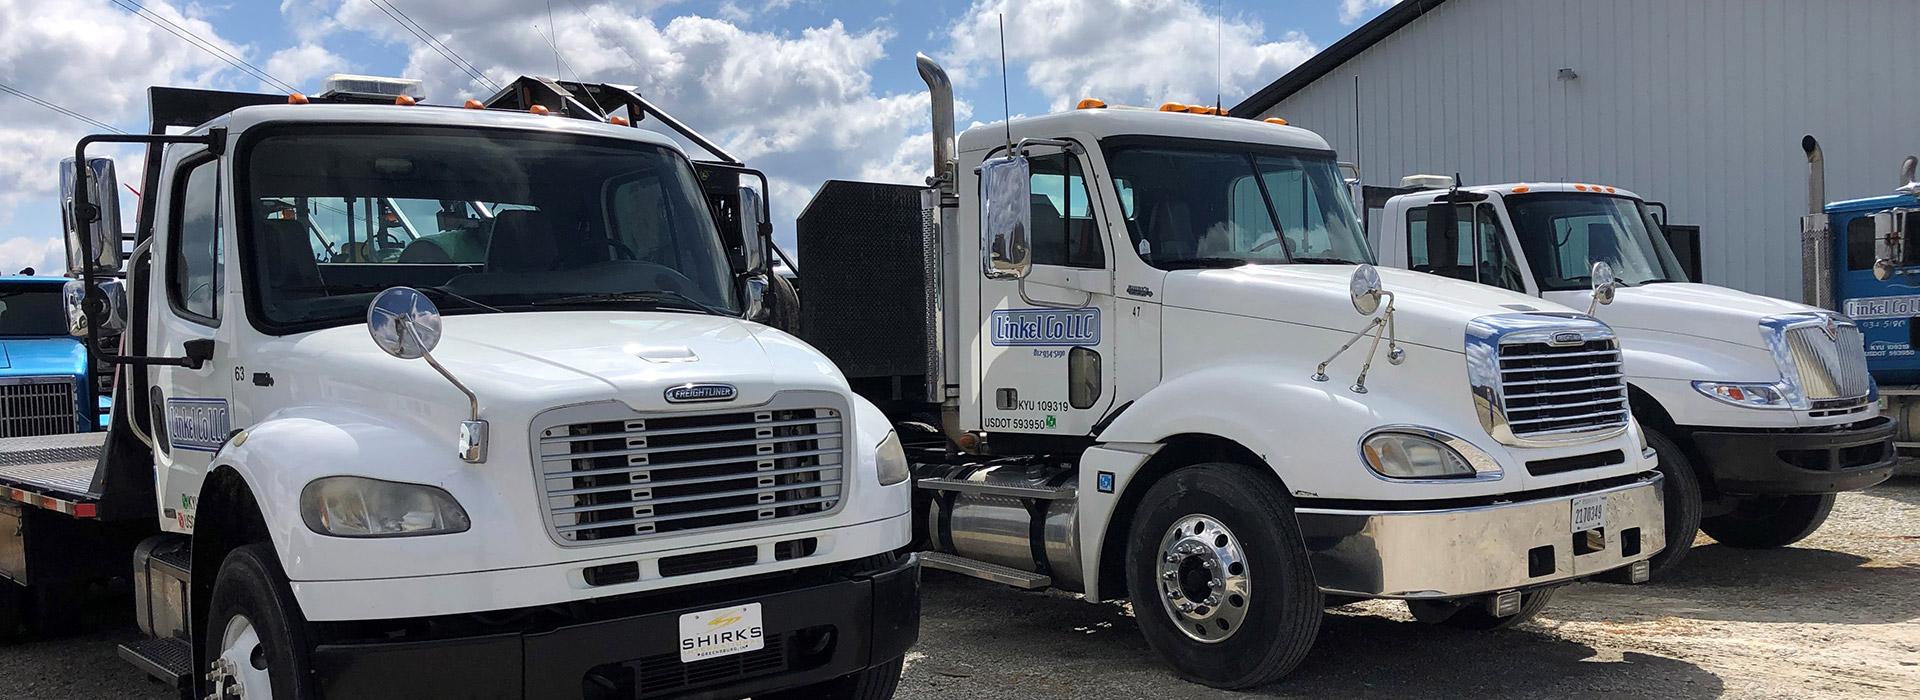 Linkel Company trucks